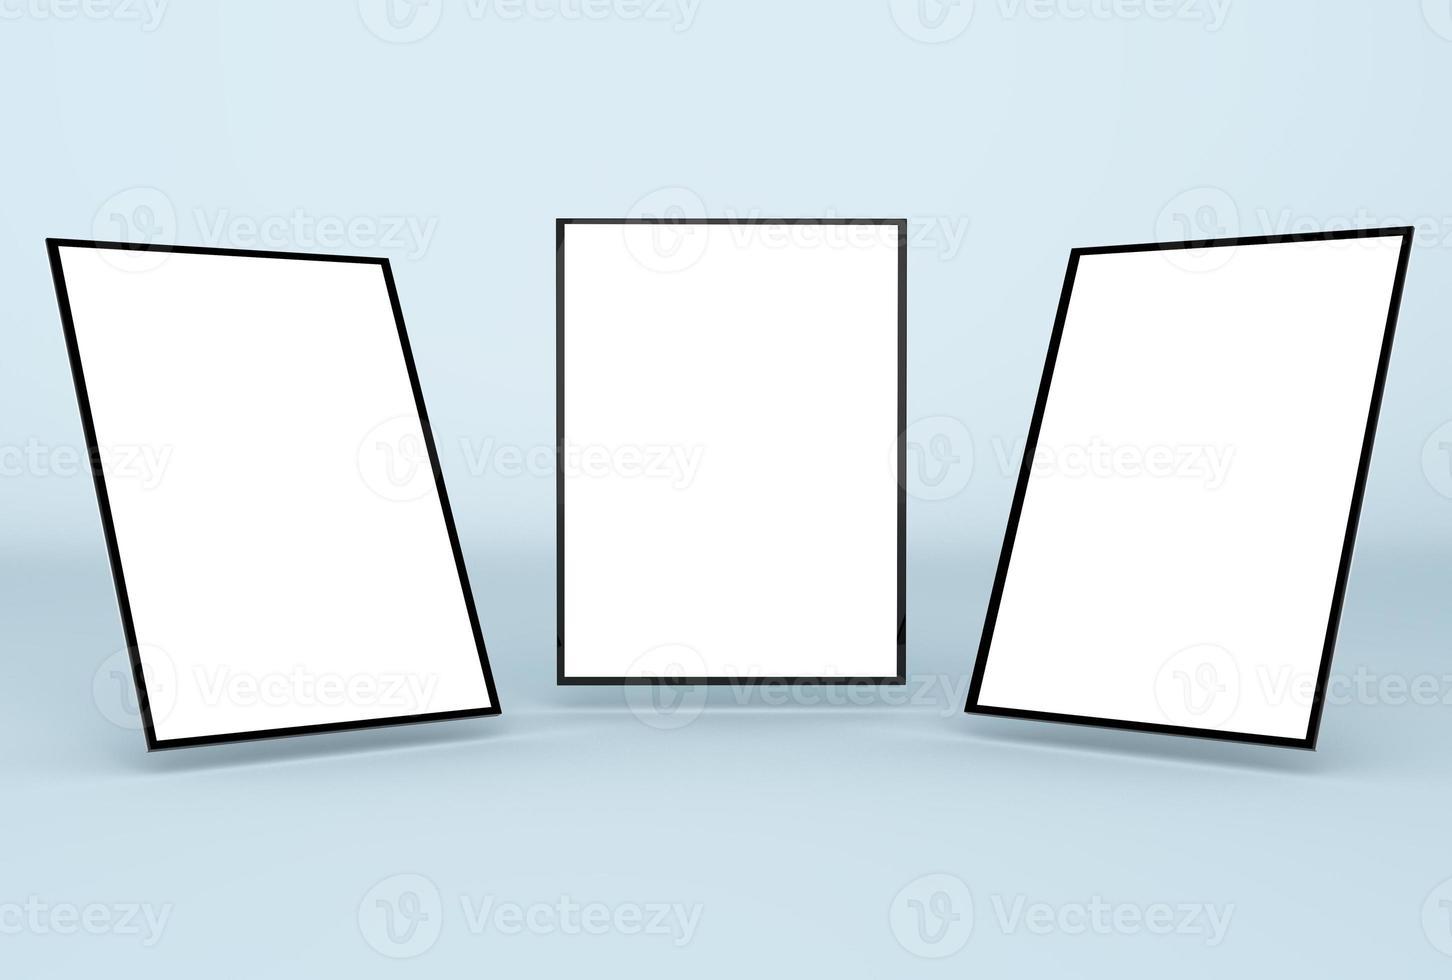 modelo da web responsivo / modelo de aplicativo responsivo foto